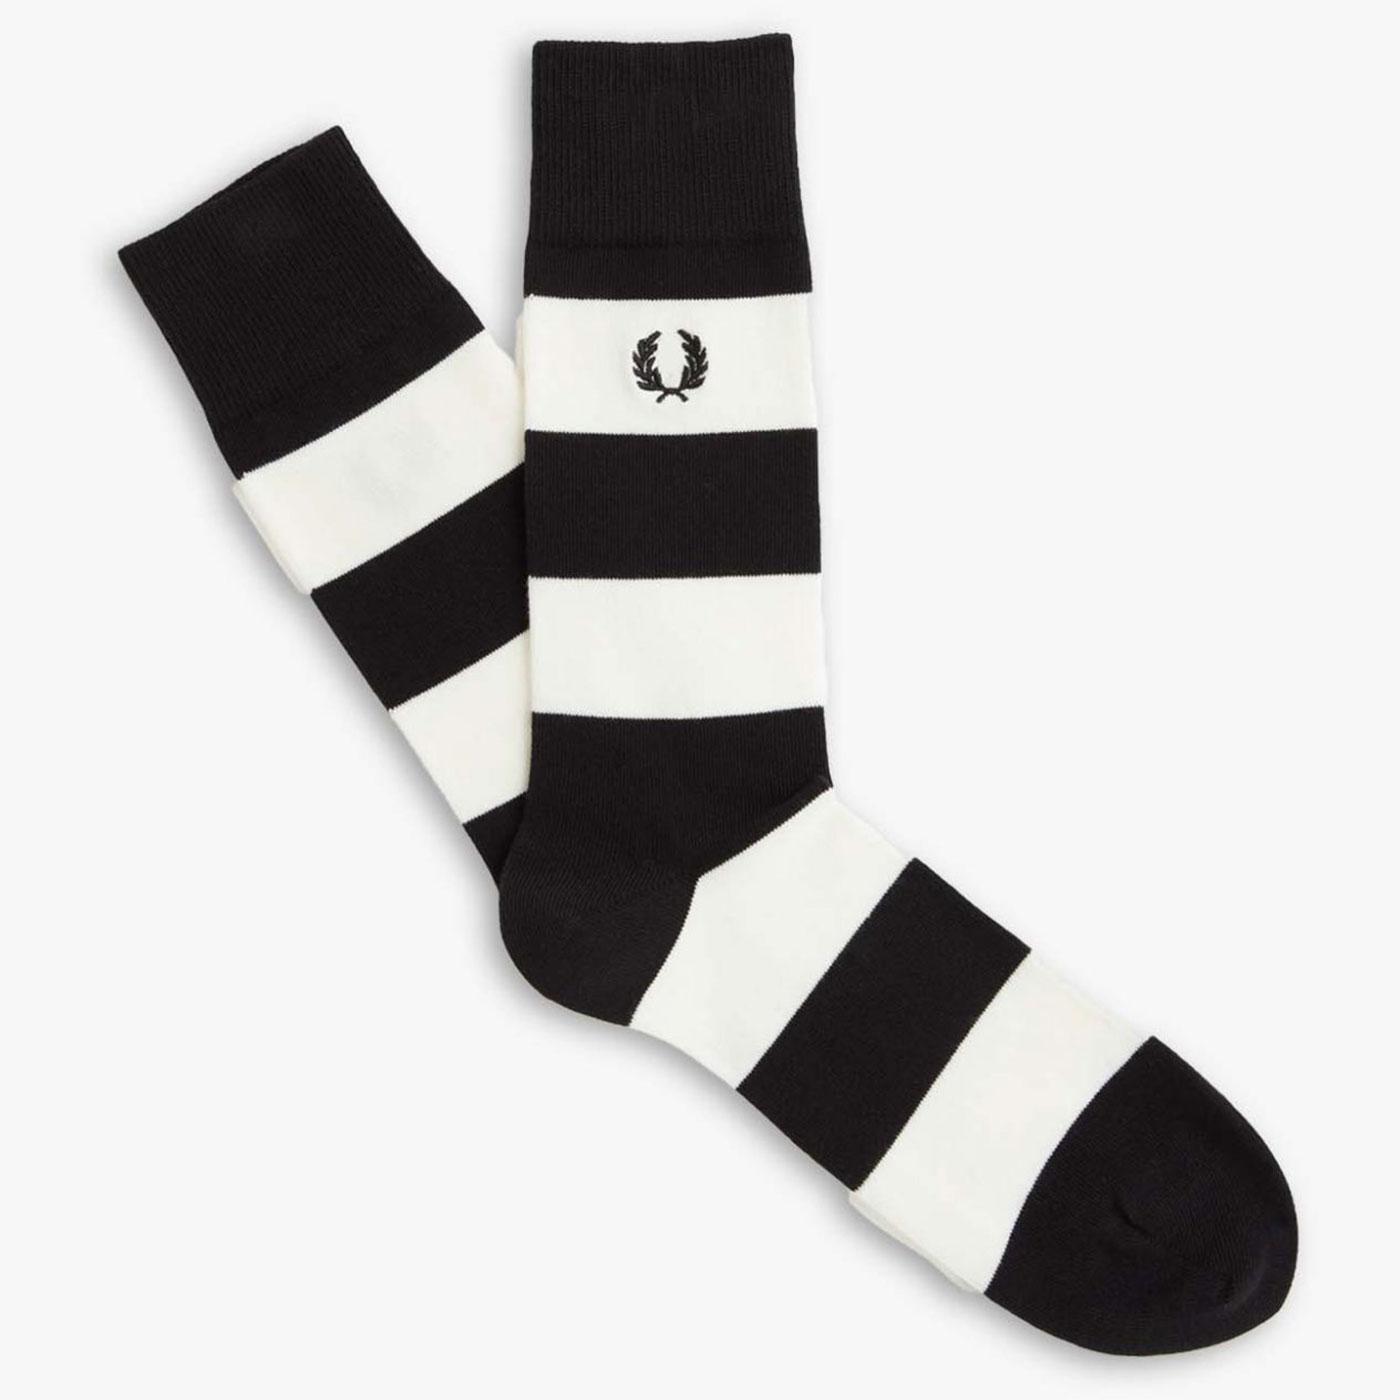 FRED PERRY Retro Block Stripe Socks - Black/Snow